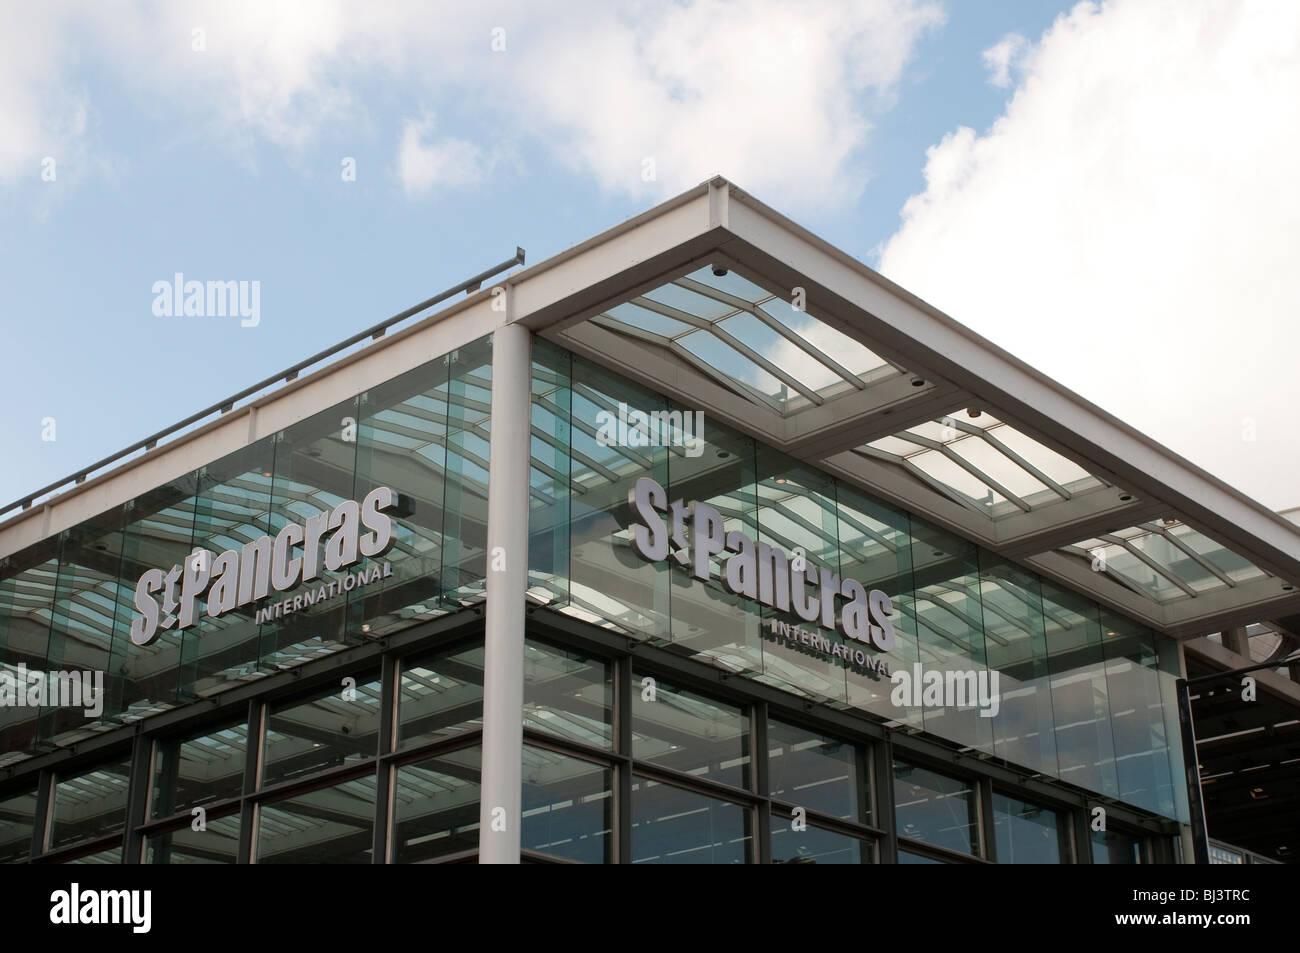 St Pancras Station, London, UK - Stock Image